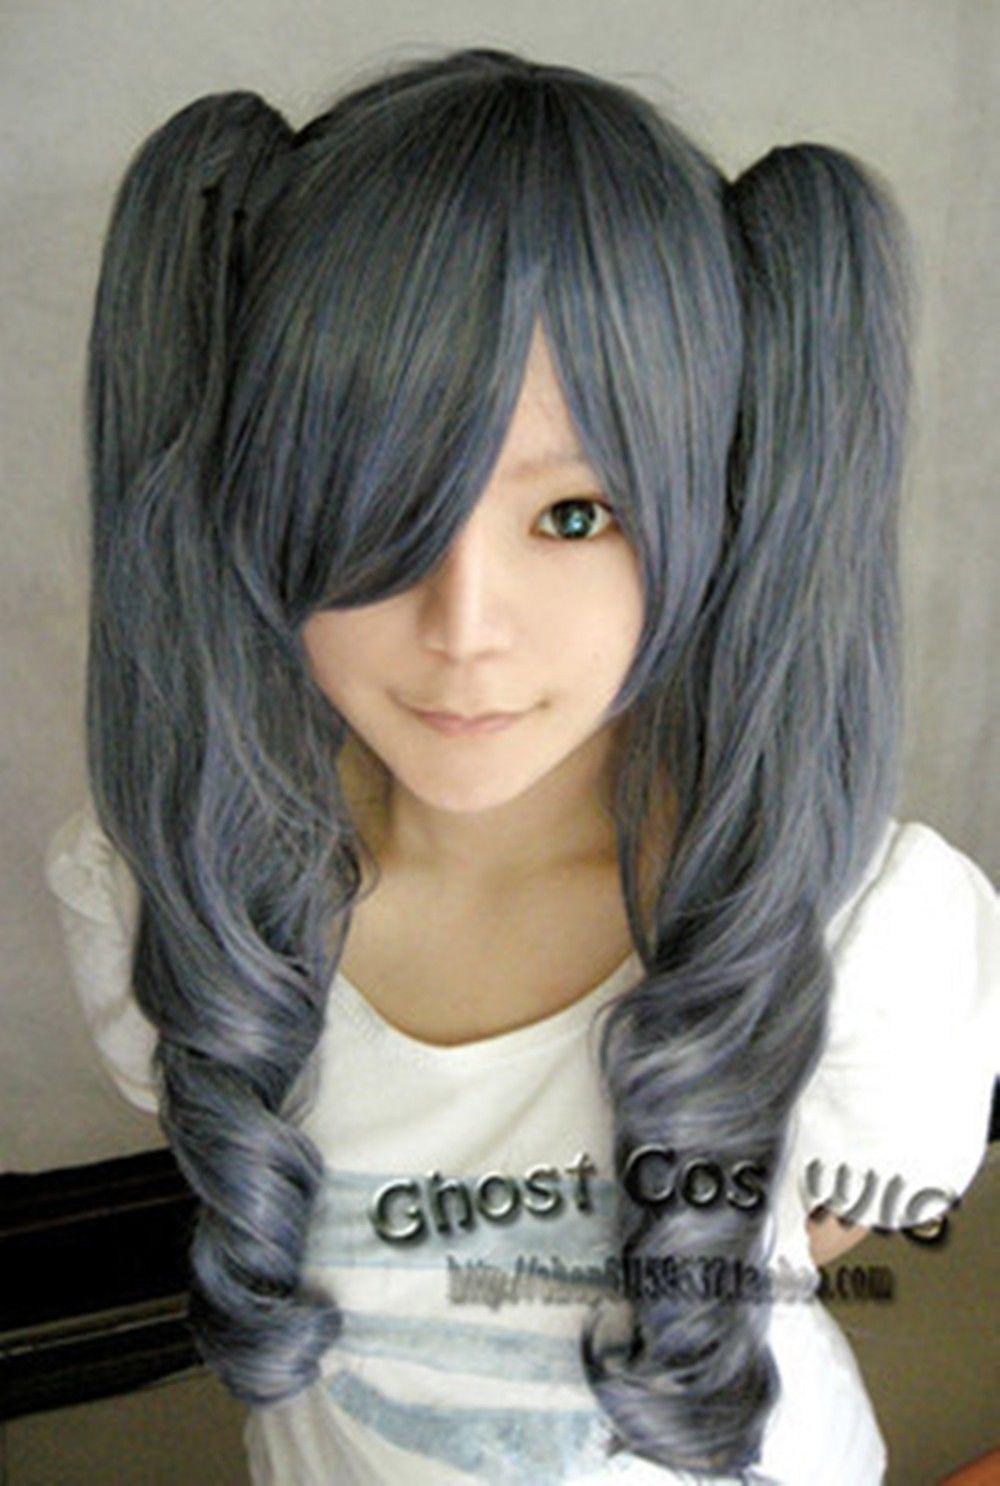 Black Butler Kuroshitsuji Ciel Phantomhive Girl Ver Blue mix Grey Cosplay Wig &gt;&gt;Party cosplays heat resistant free shipping<br><br>Aliexpress